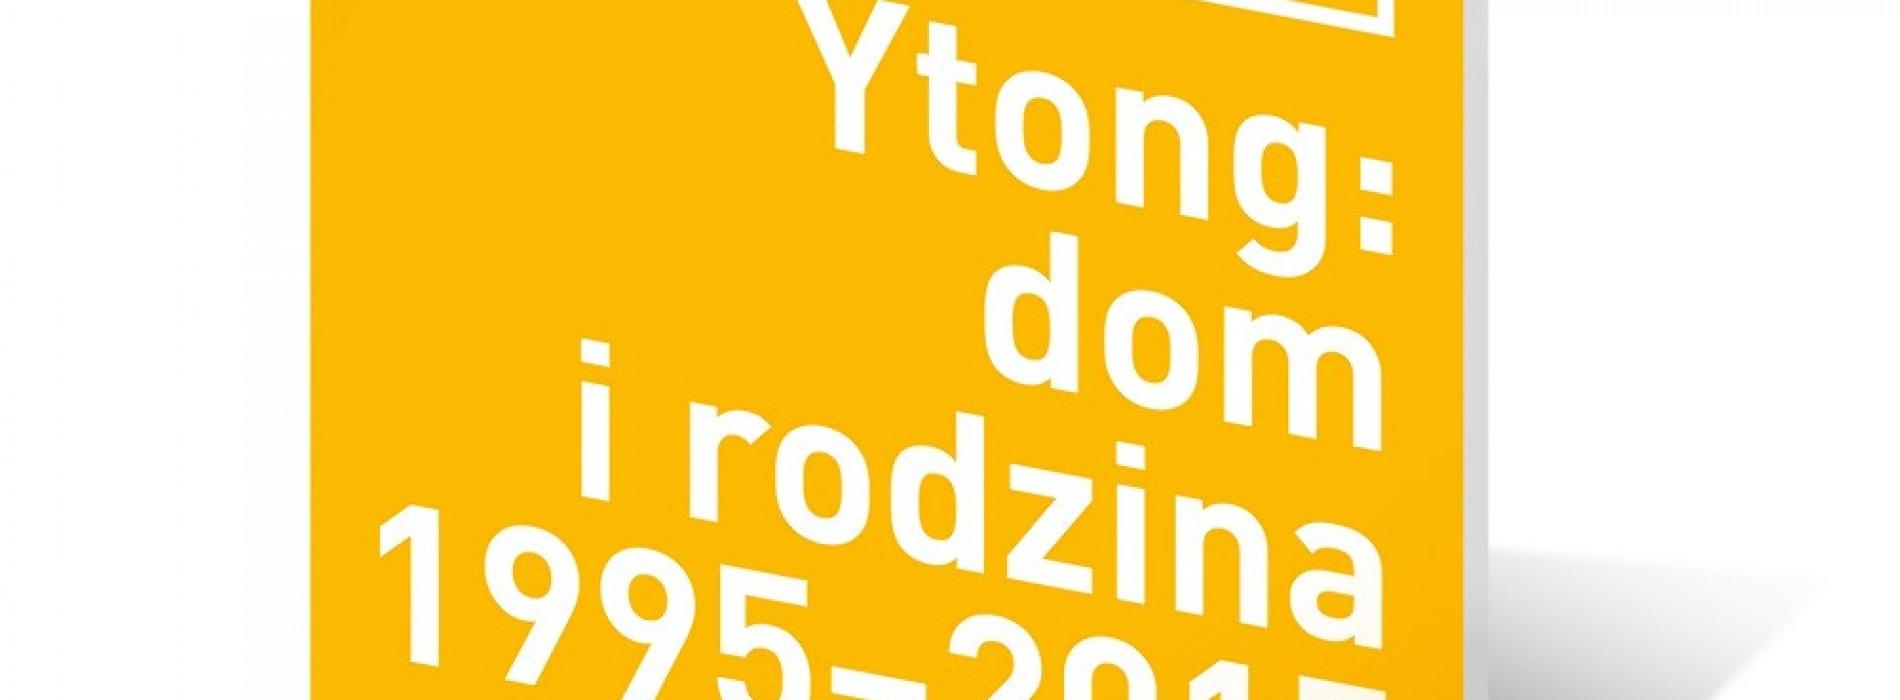 Ytong 20 lat w Polsce